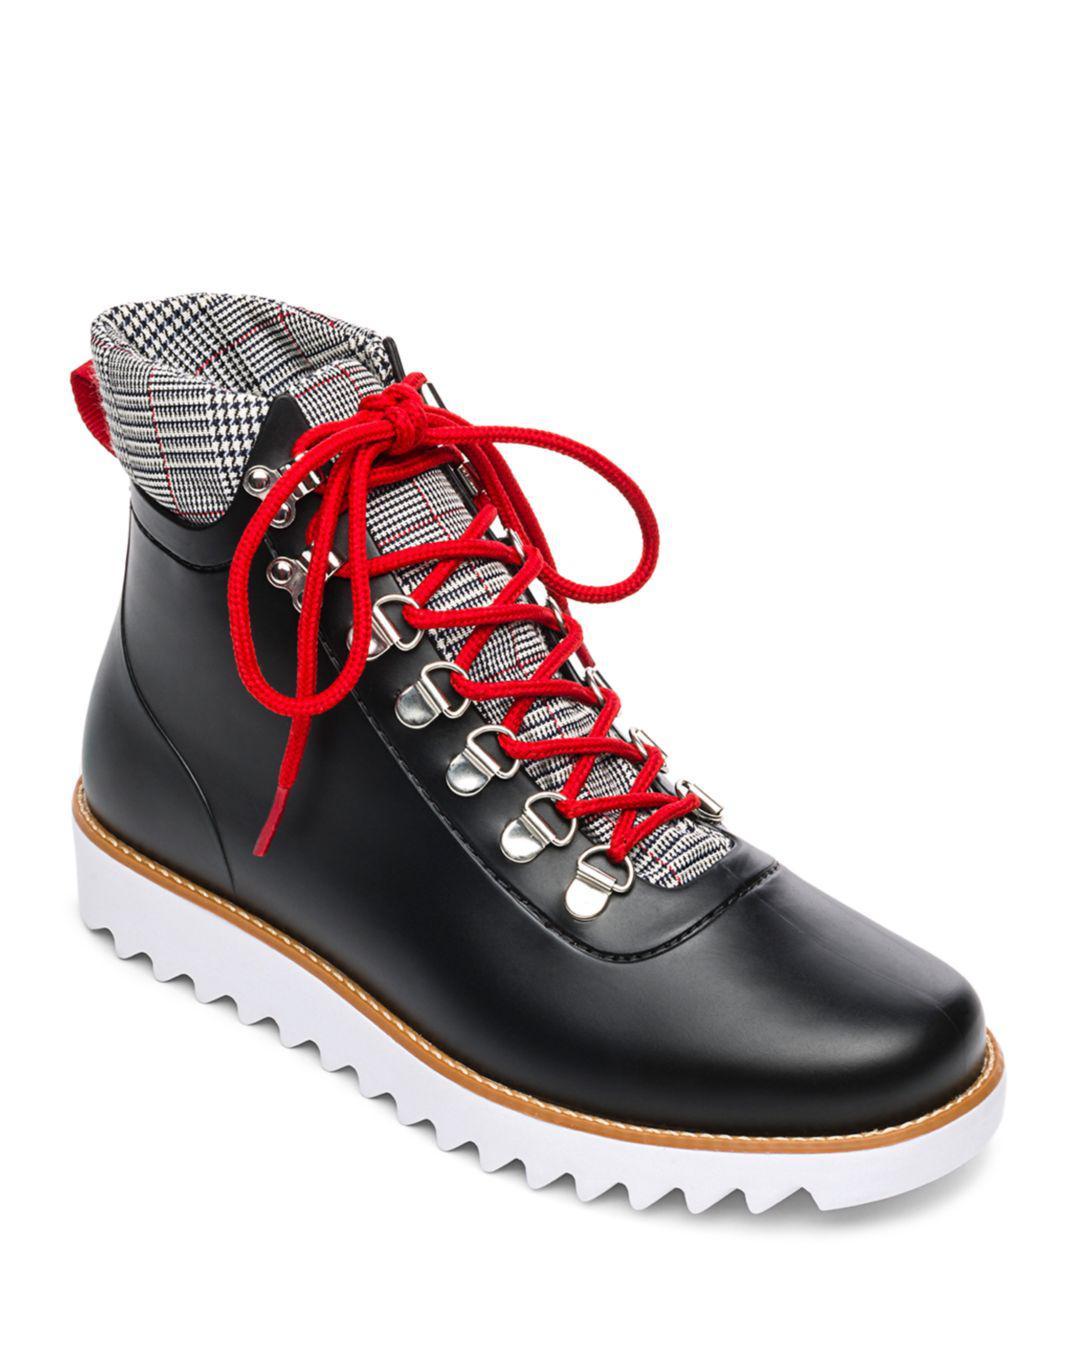 38b0623279dbef Lyst - Bernardo Winnie Lace-up Rubber Rain Boots in Black